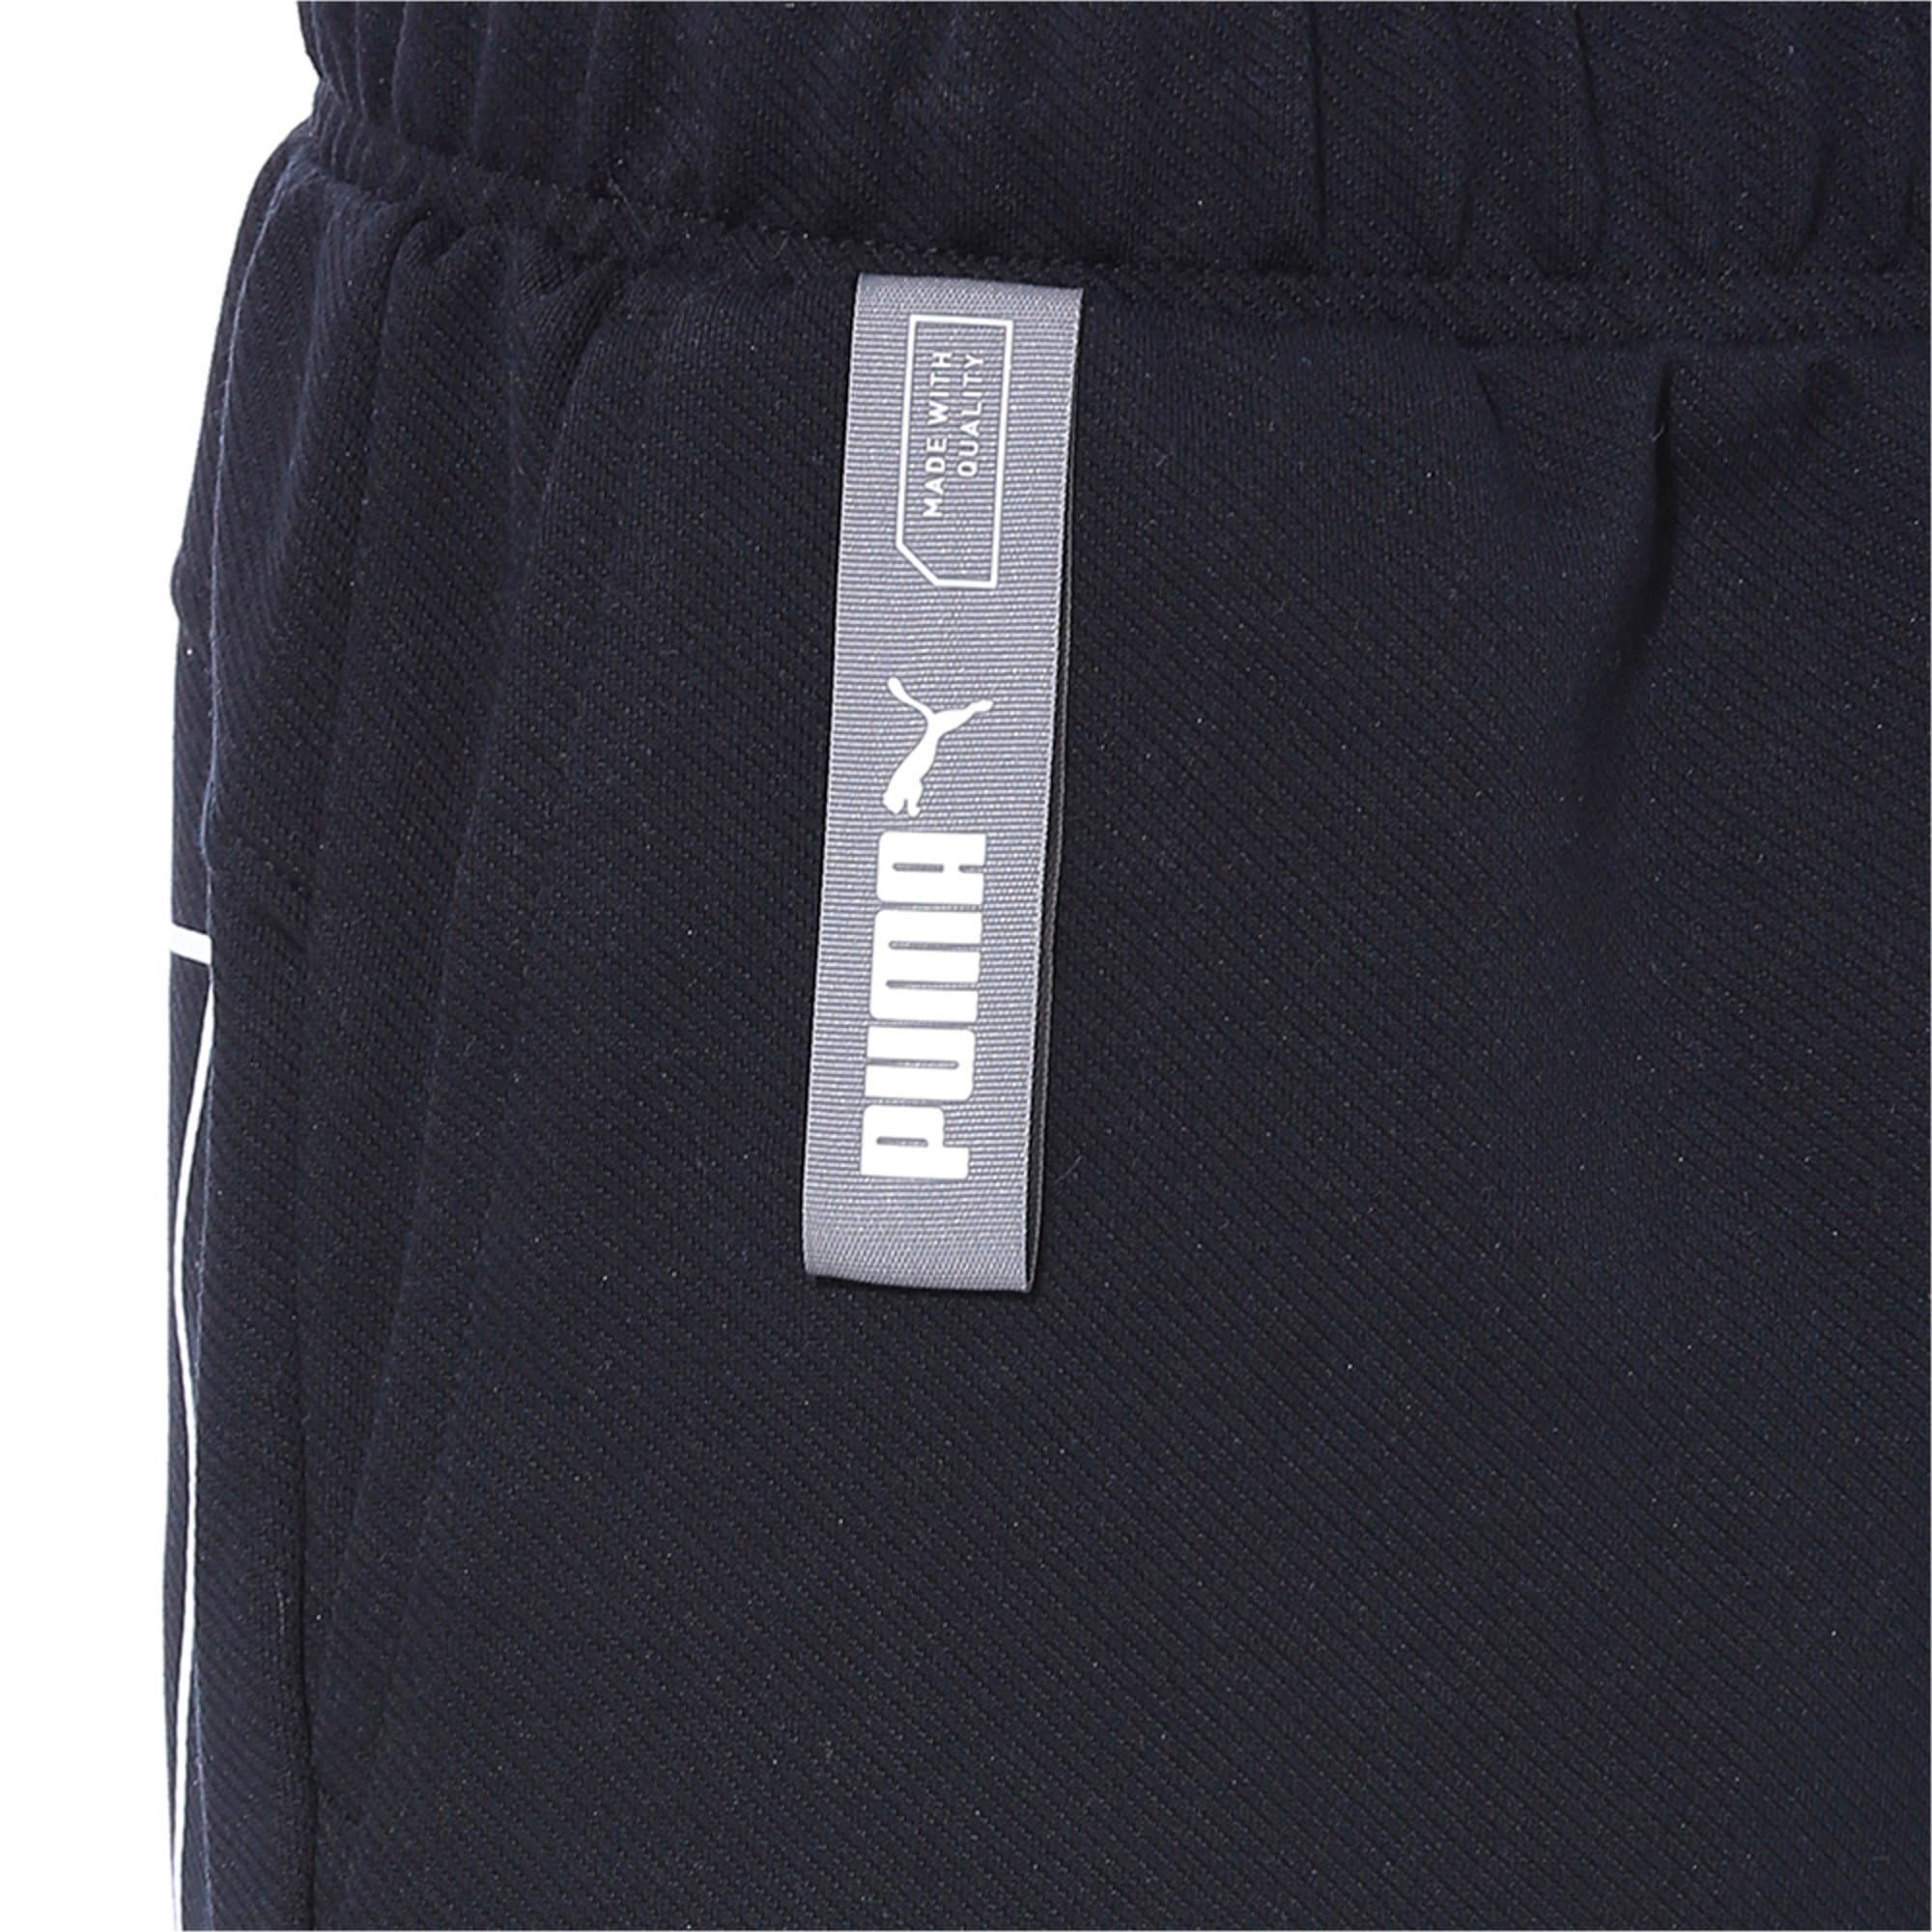 Thumbnail 6 of NU-TILITY Men's Shorts, Puma Black, medium-IND